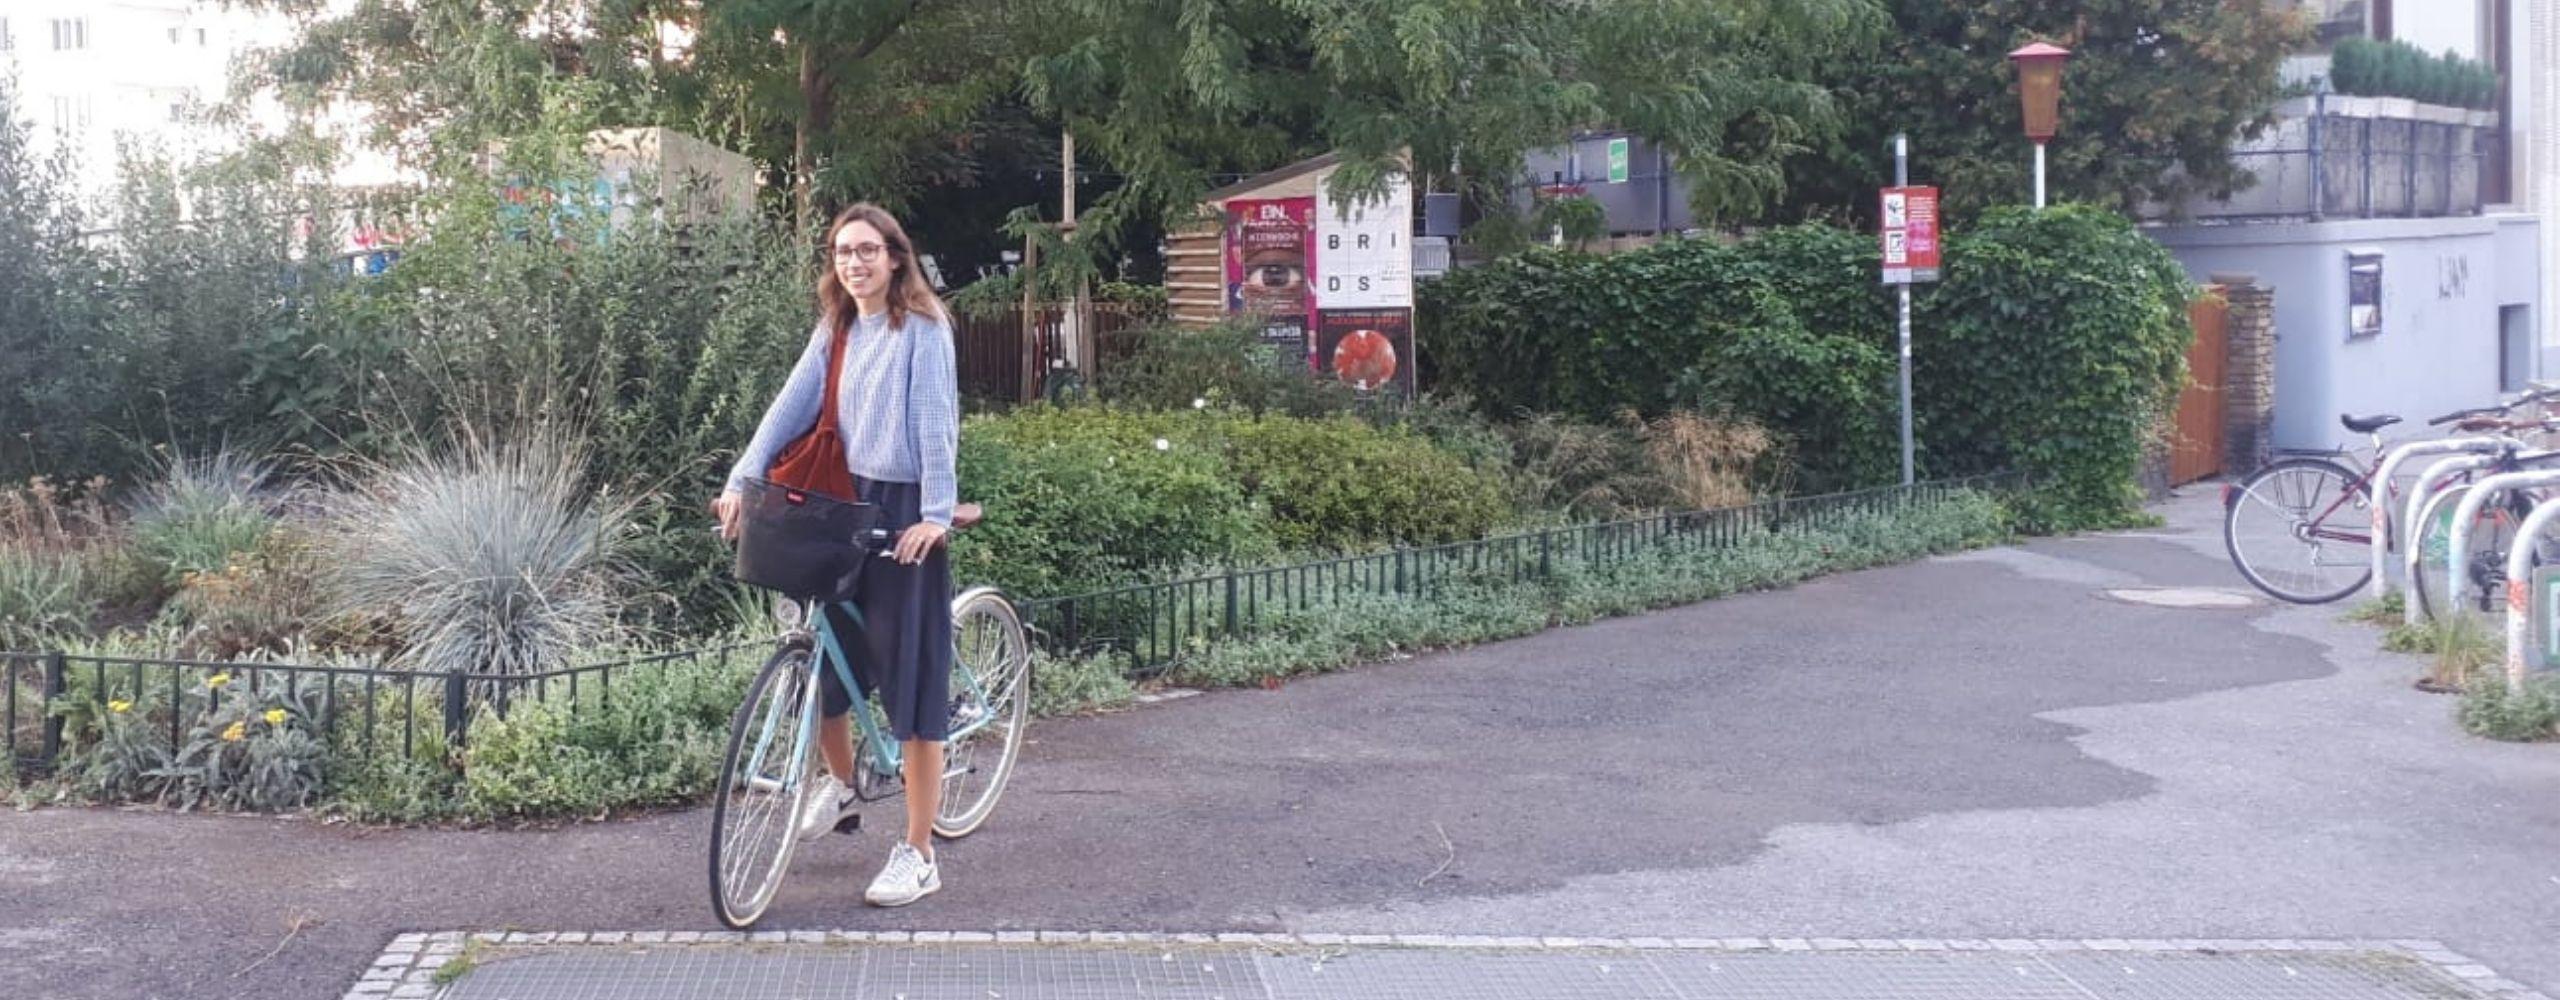 Andrea mit ihrem Fahrrad